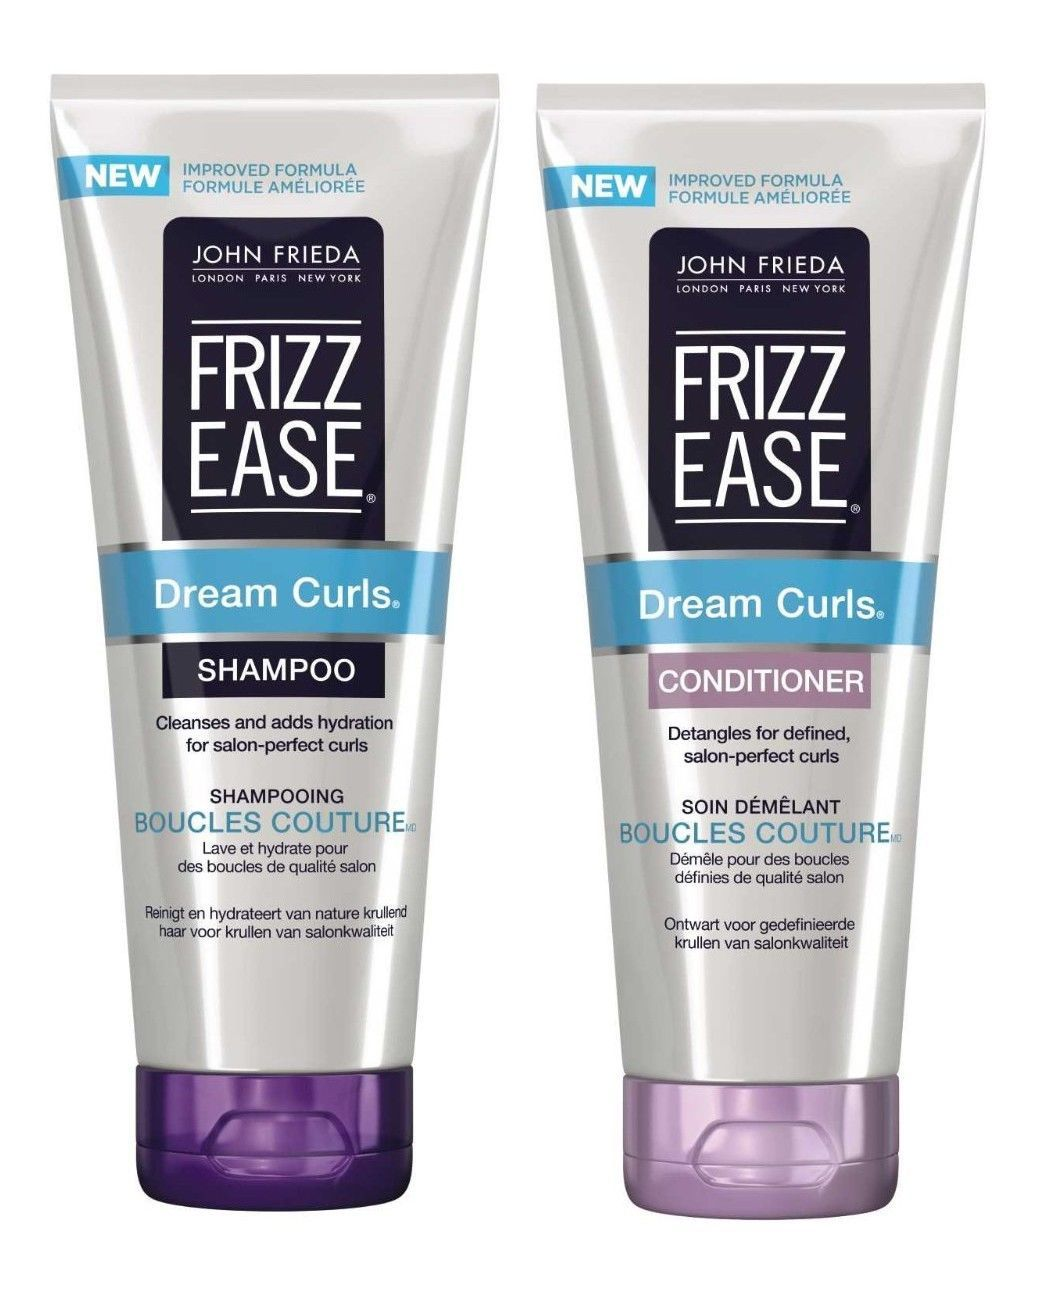 john frieda frizz ease dream curls shampoo conditioner. Black Bedroom Furniture Sets. Home Design Ideas